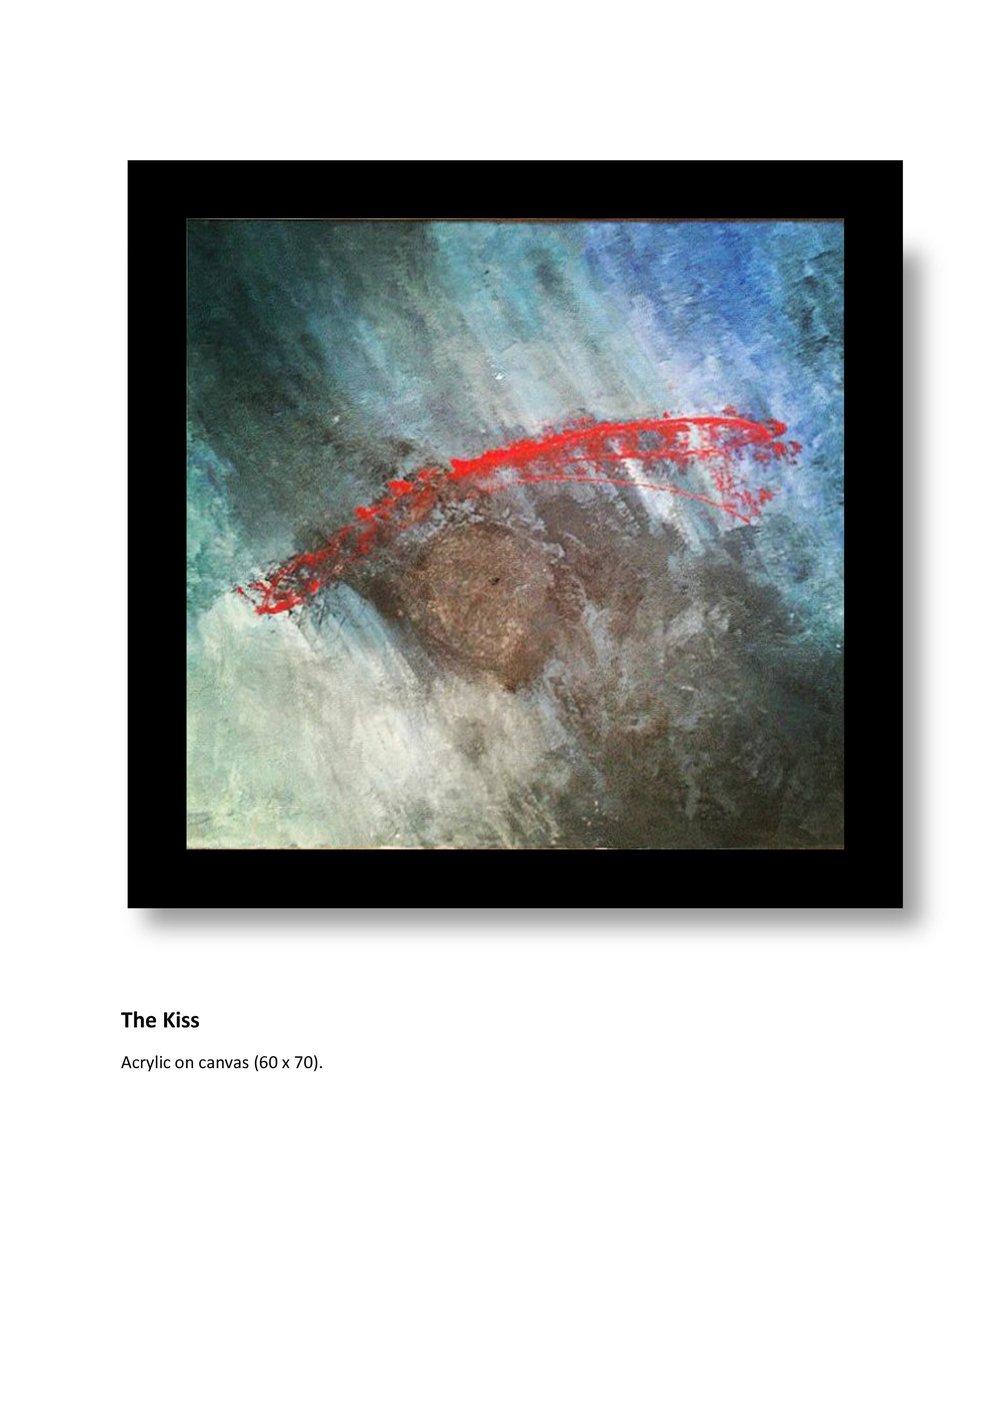 art-portfolio-aglae-corrected-22-min.jpg